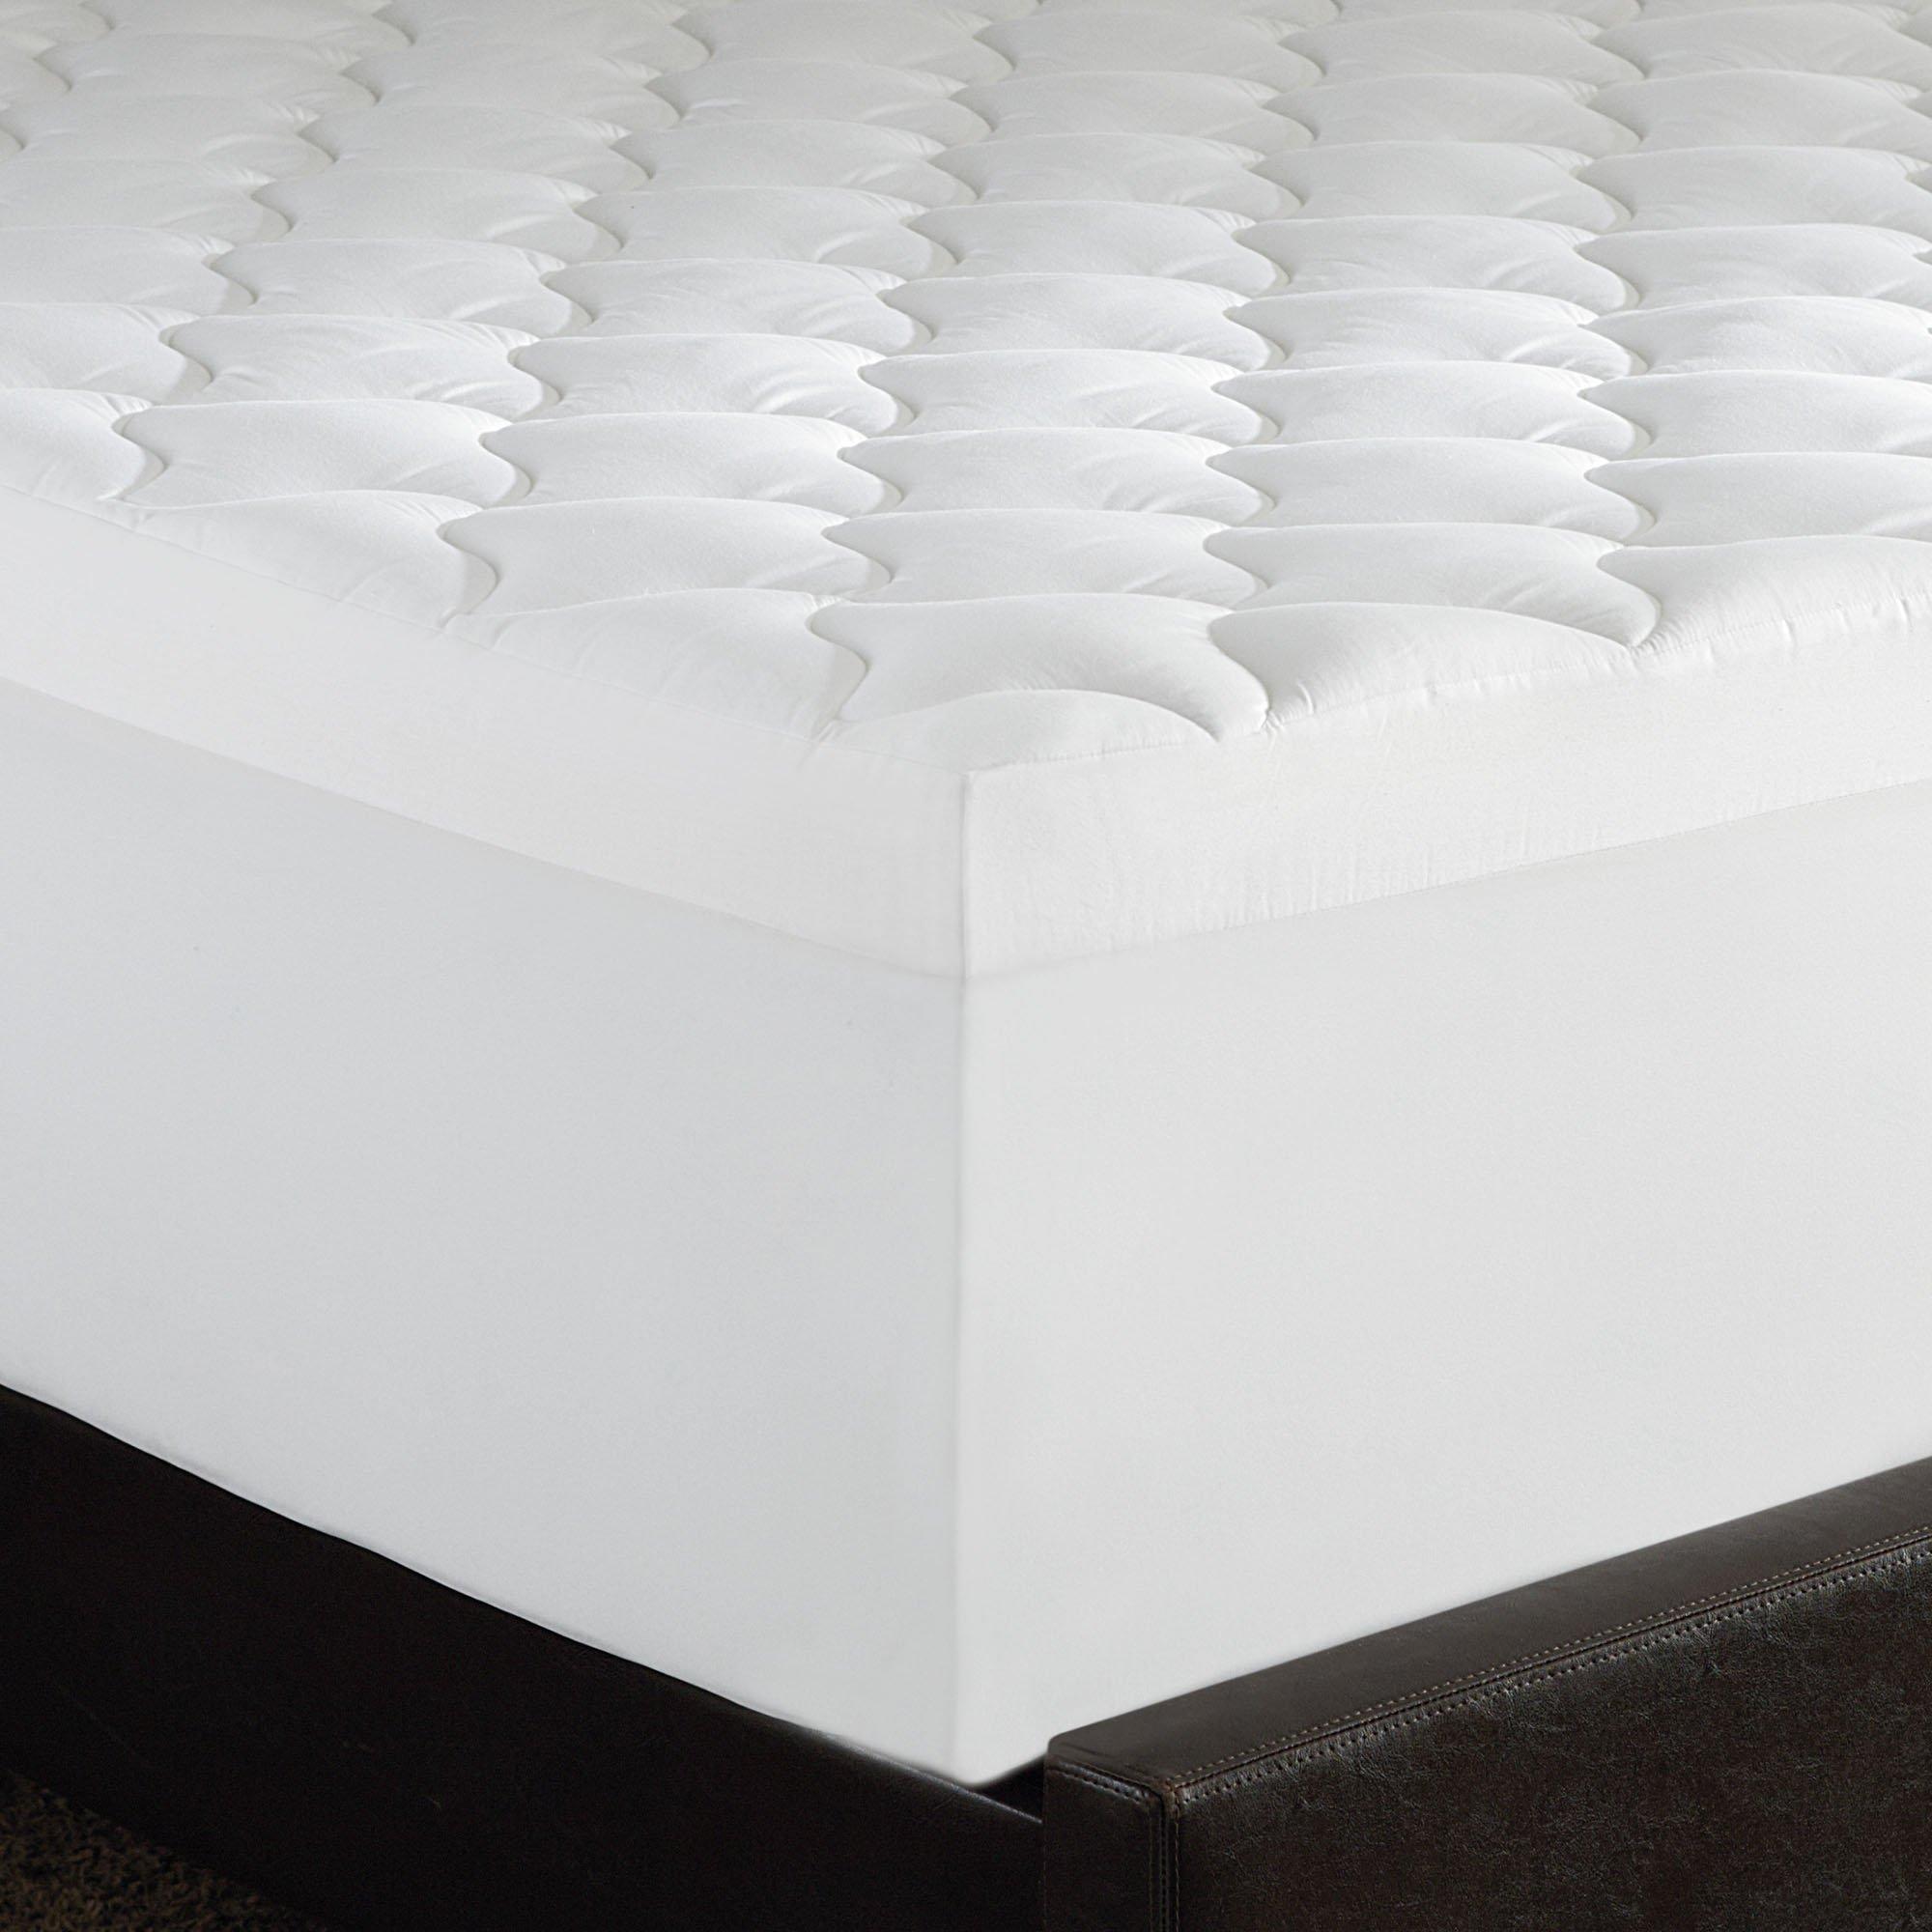 Serta Triple Layer Comfort, 4-Inch Memory Foam Mattress Topper, King